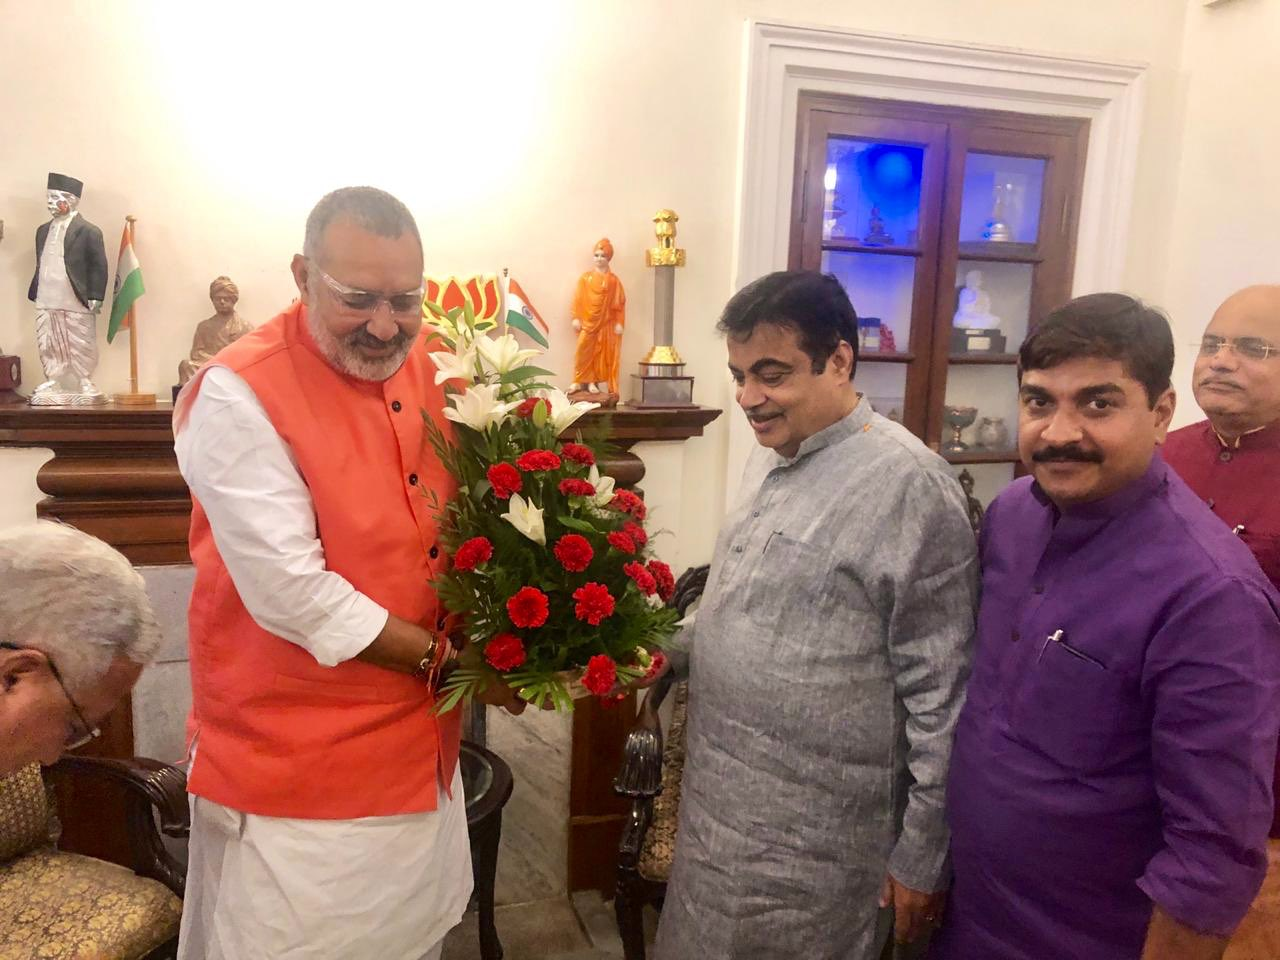 Wishing super human in Modi cabinet Shri Nitin Gadkari ji a very happy birthday i.